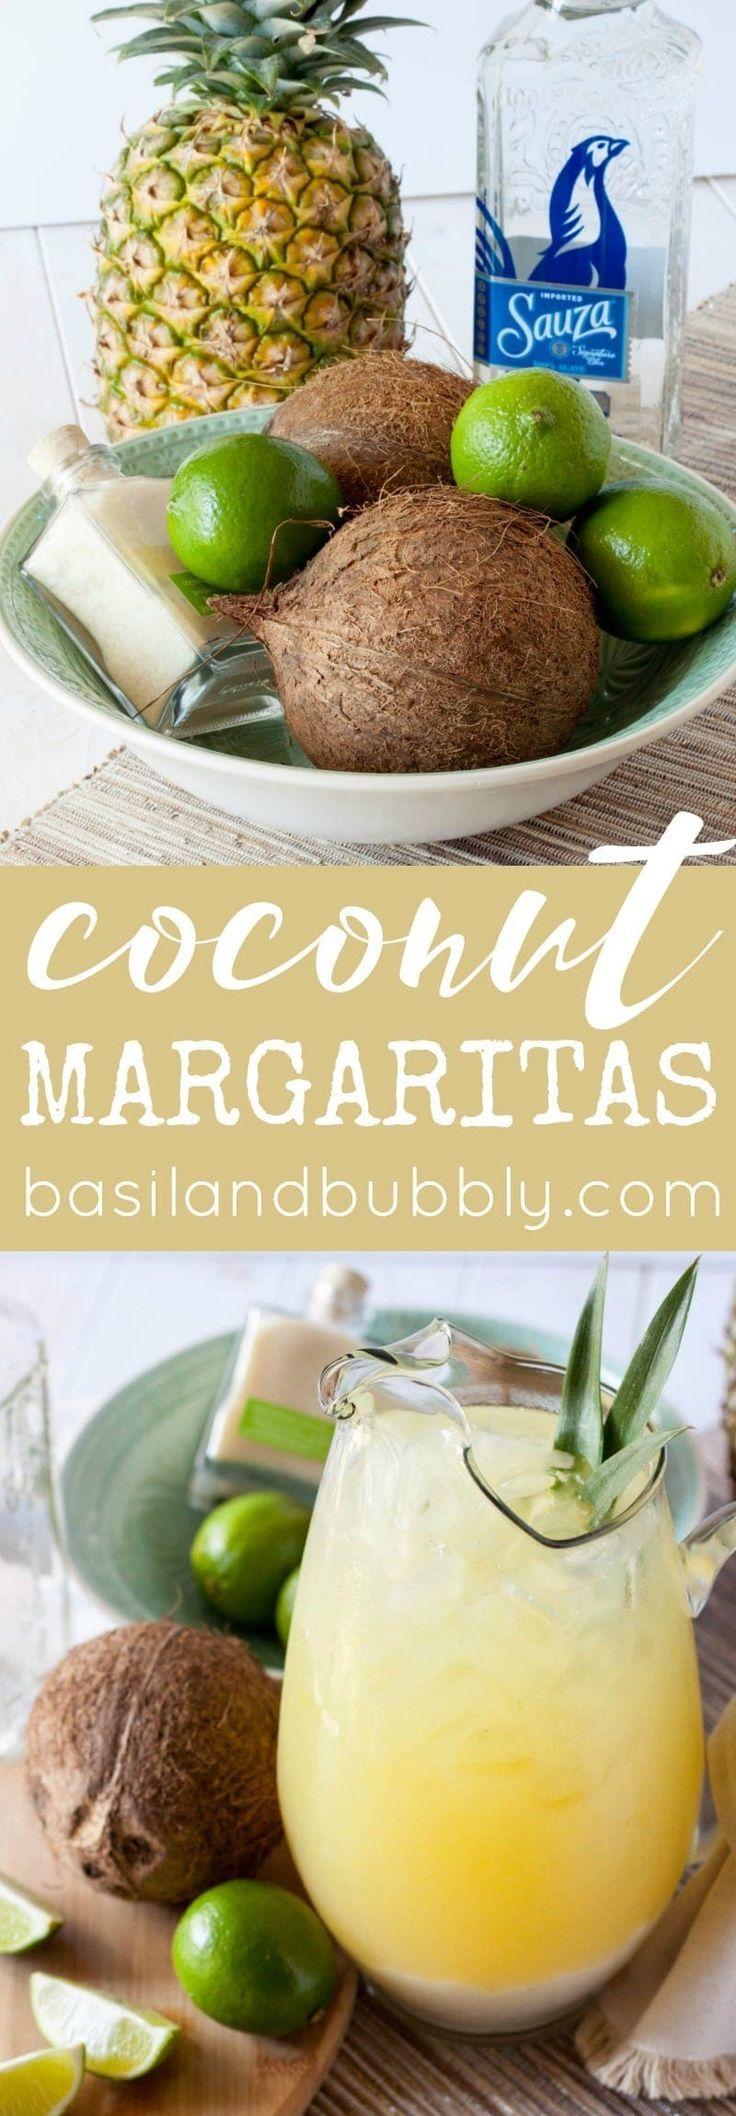 Coconut Pineapple Margarita